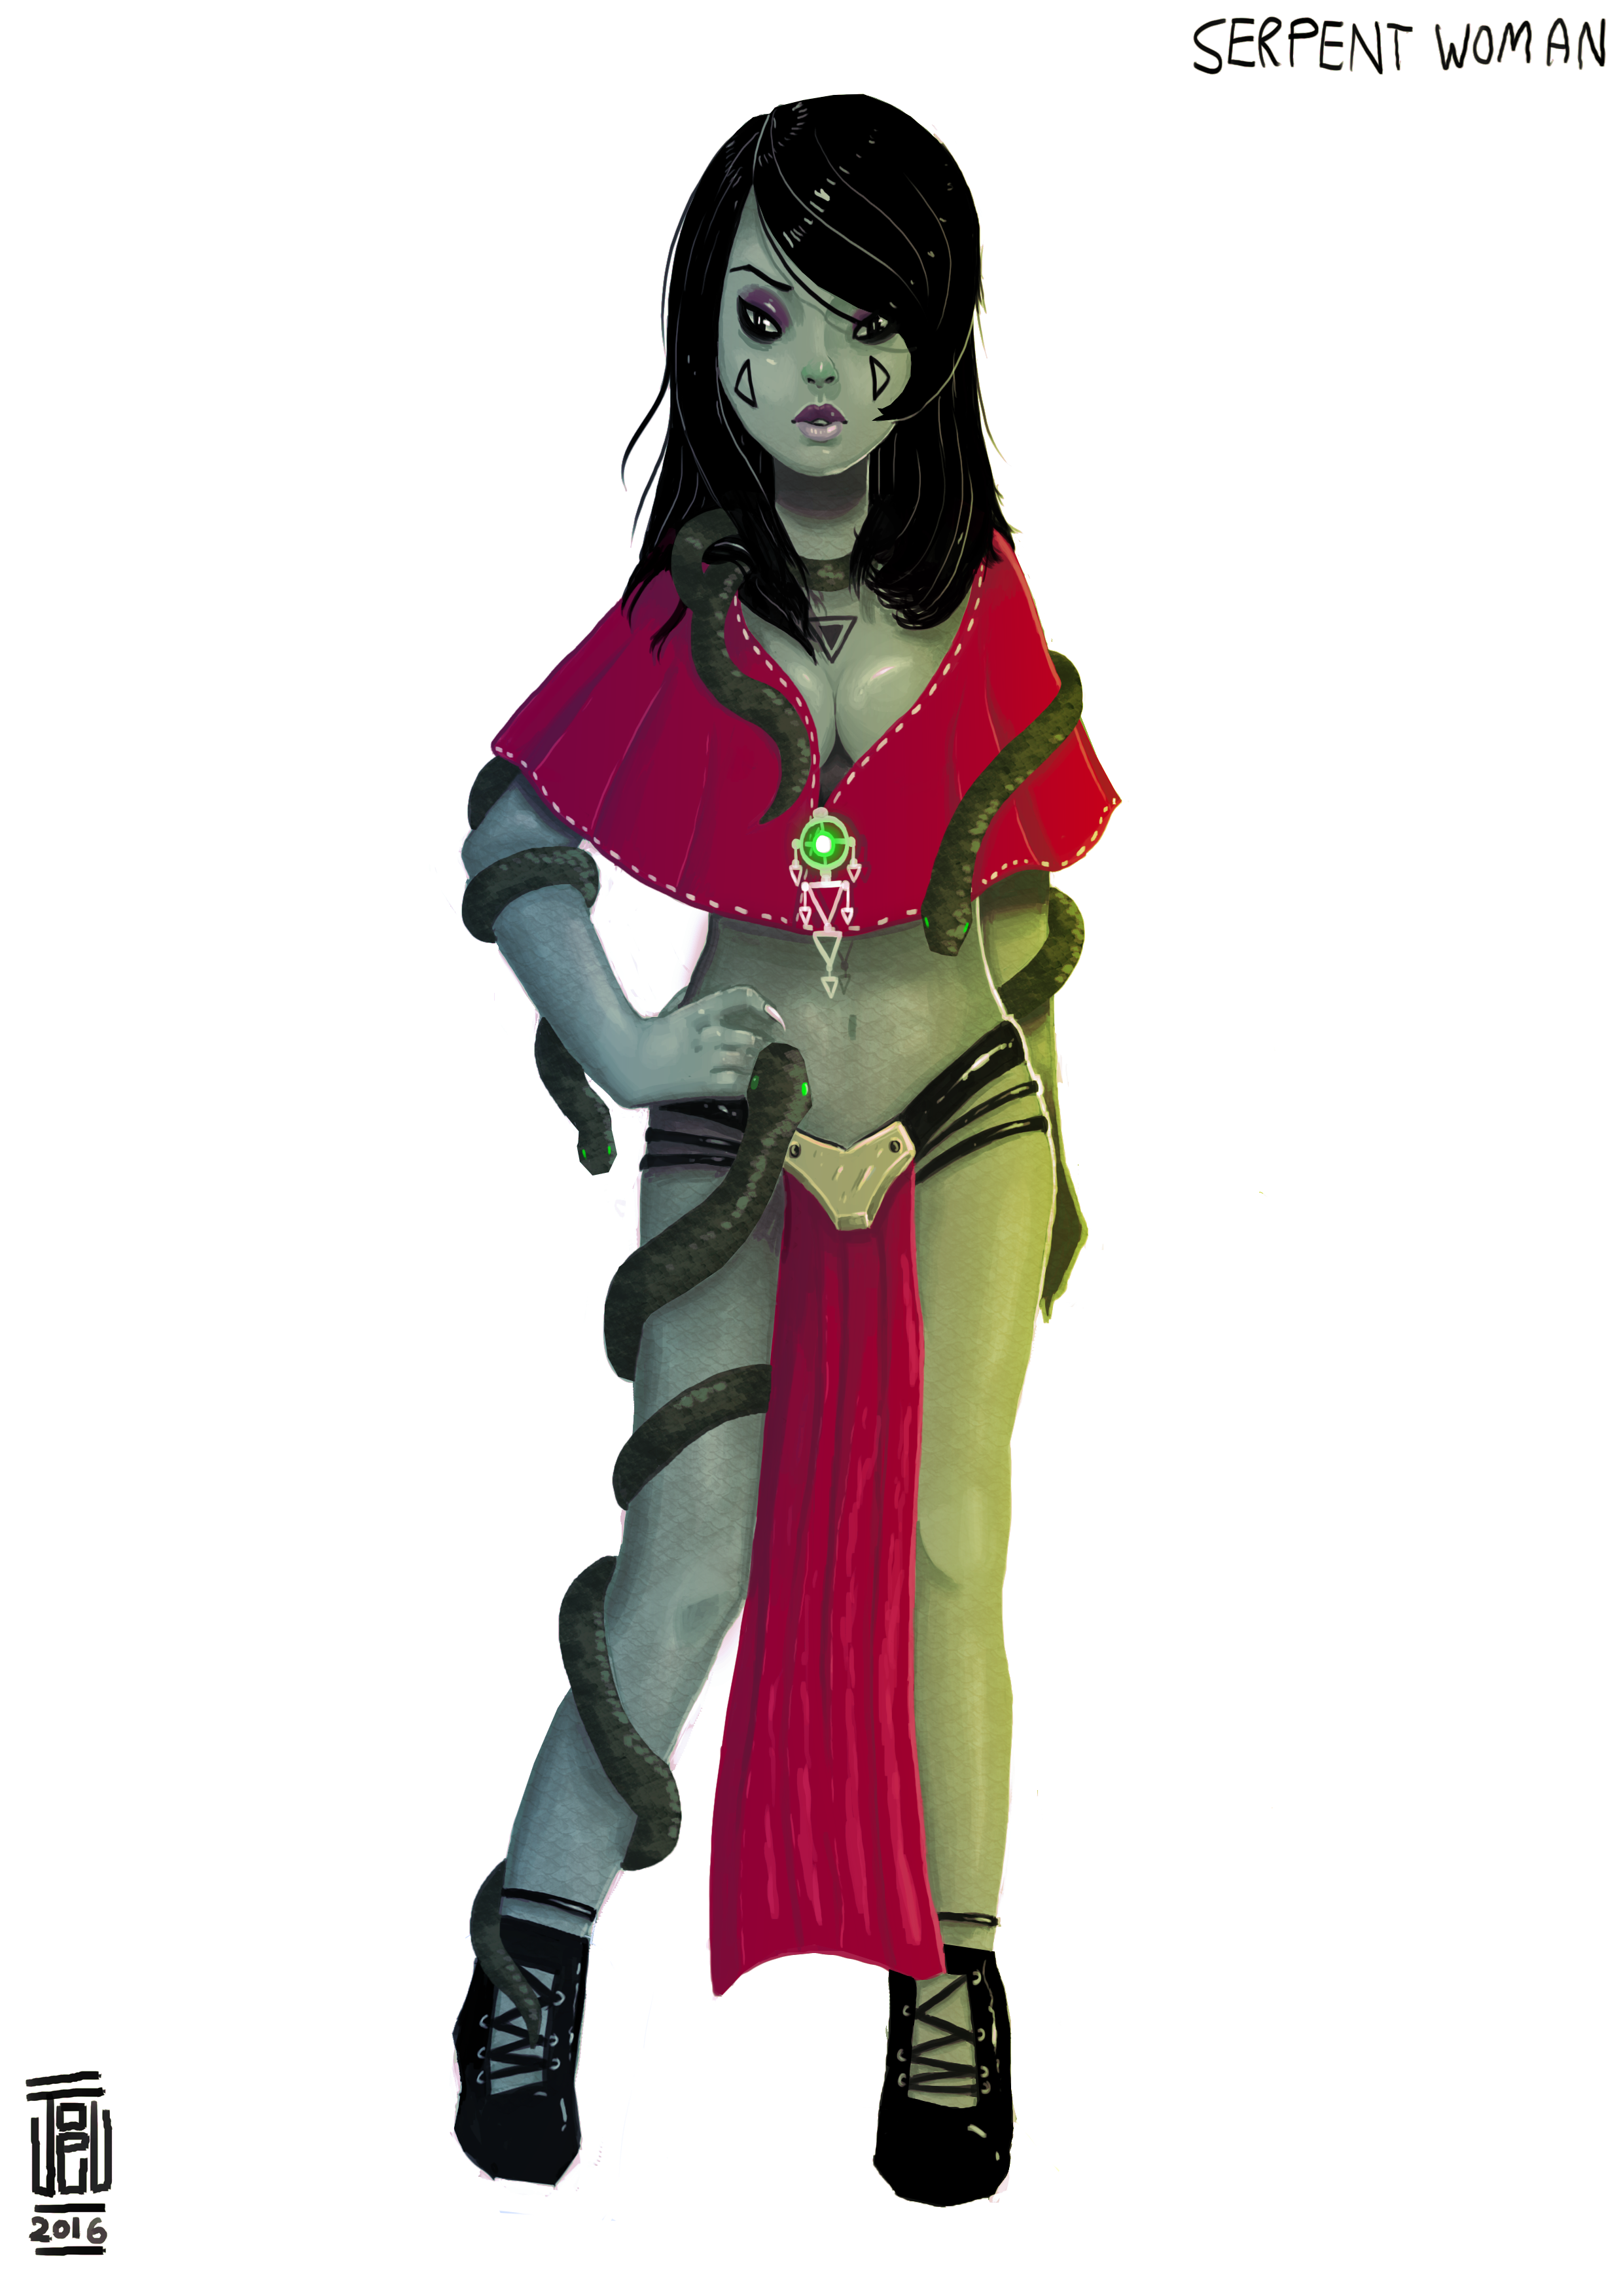 Serpent woman Concept 2